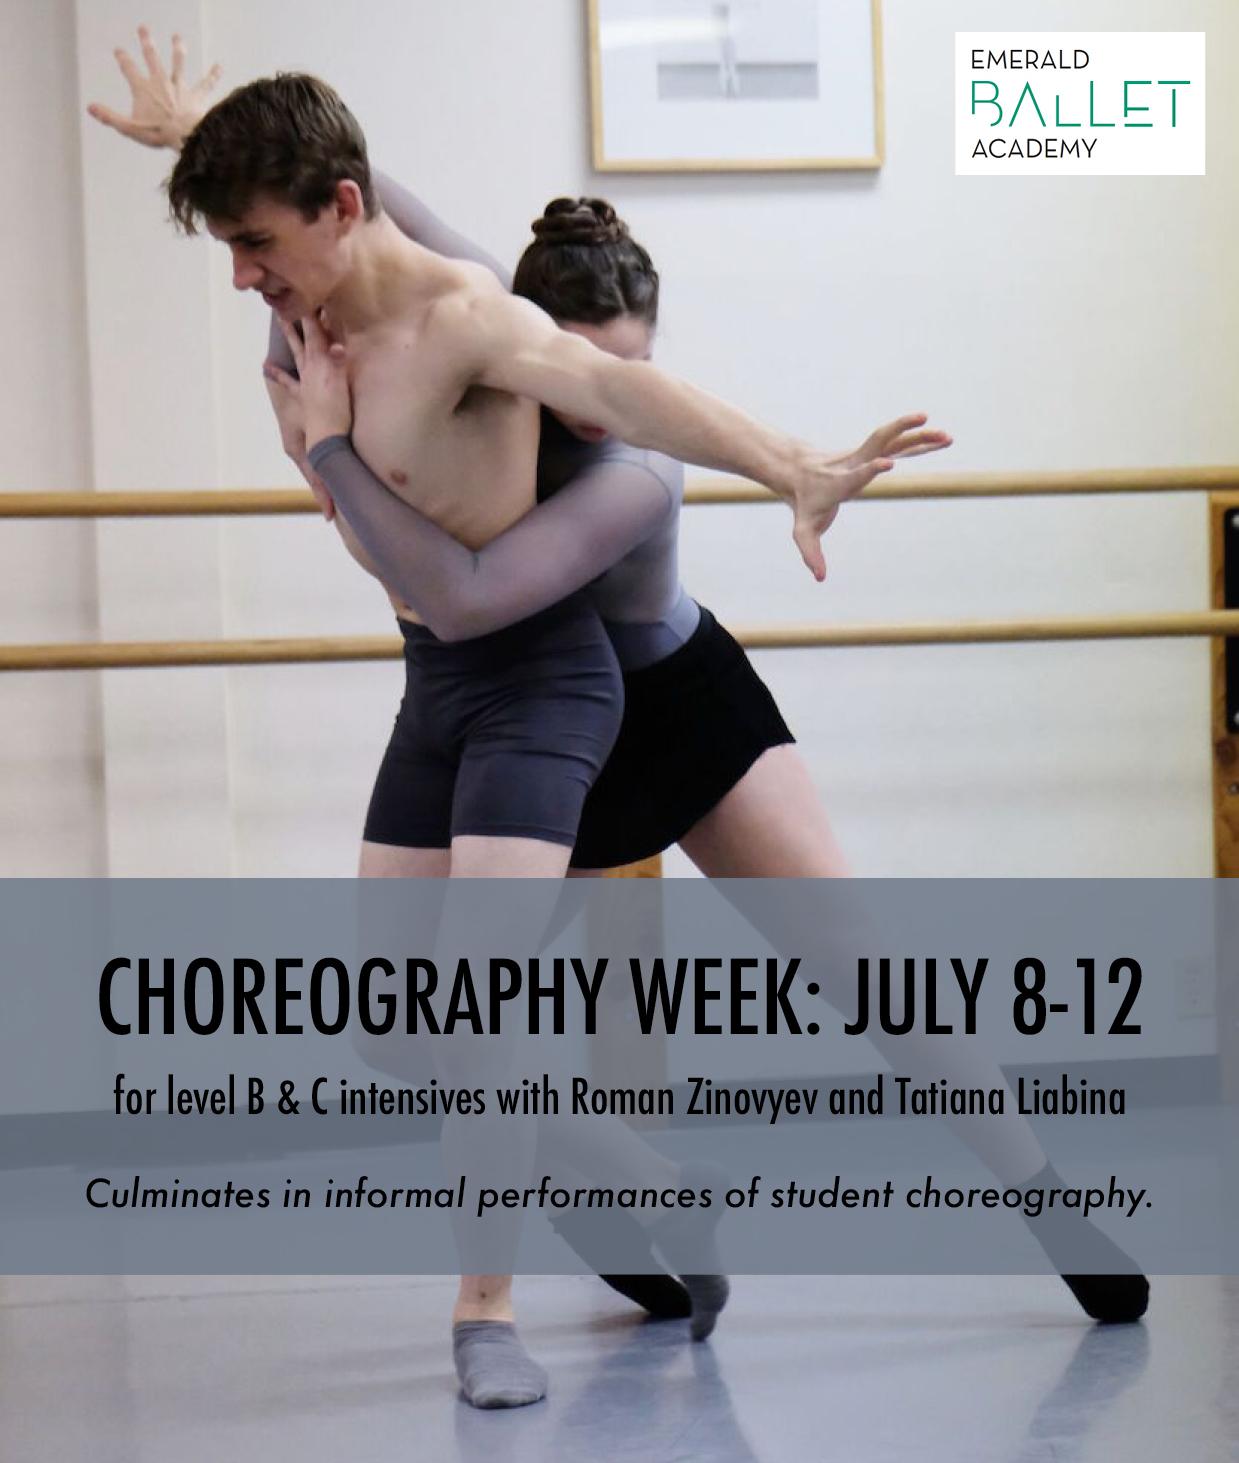 Choreography week 2019.jpg